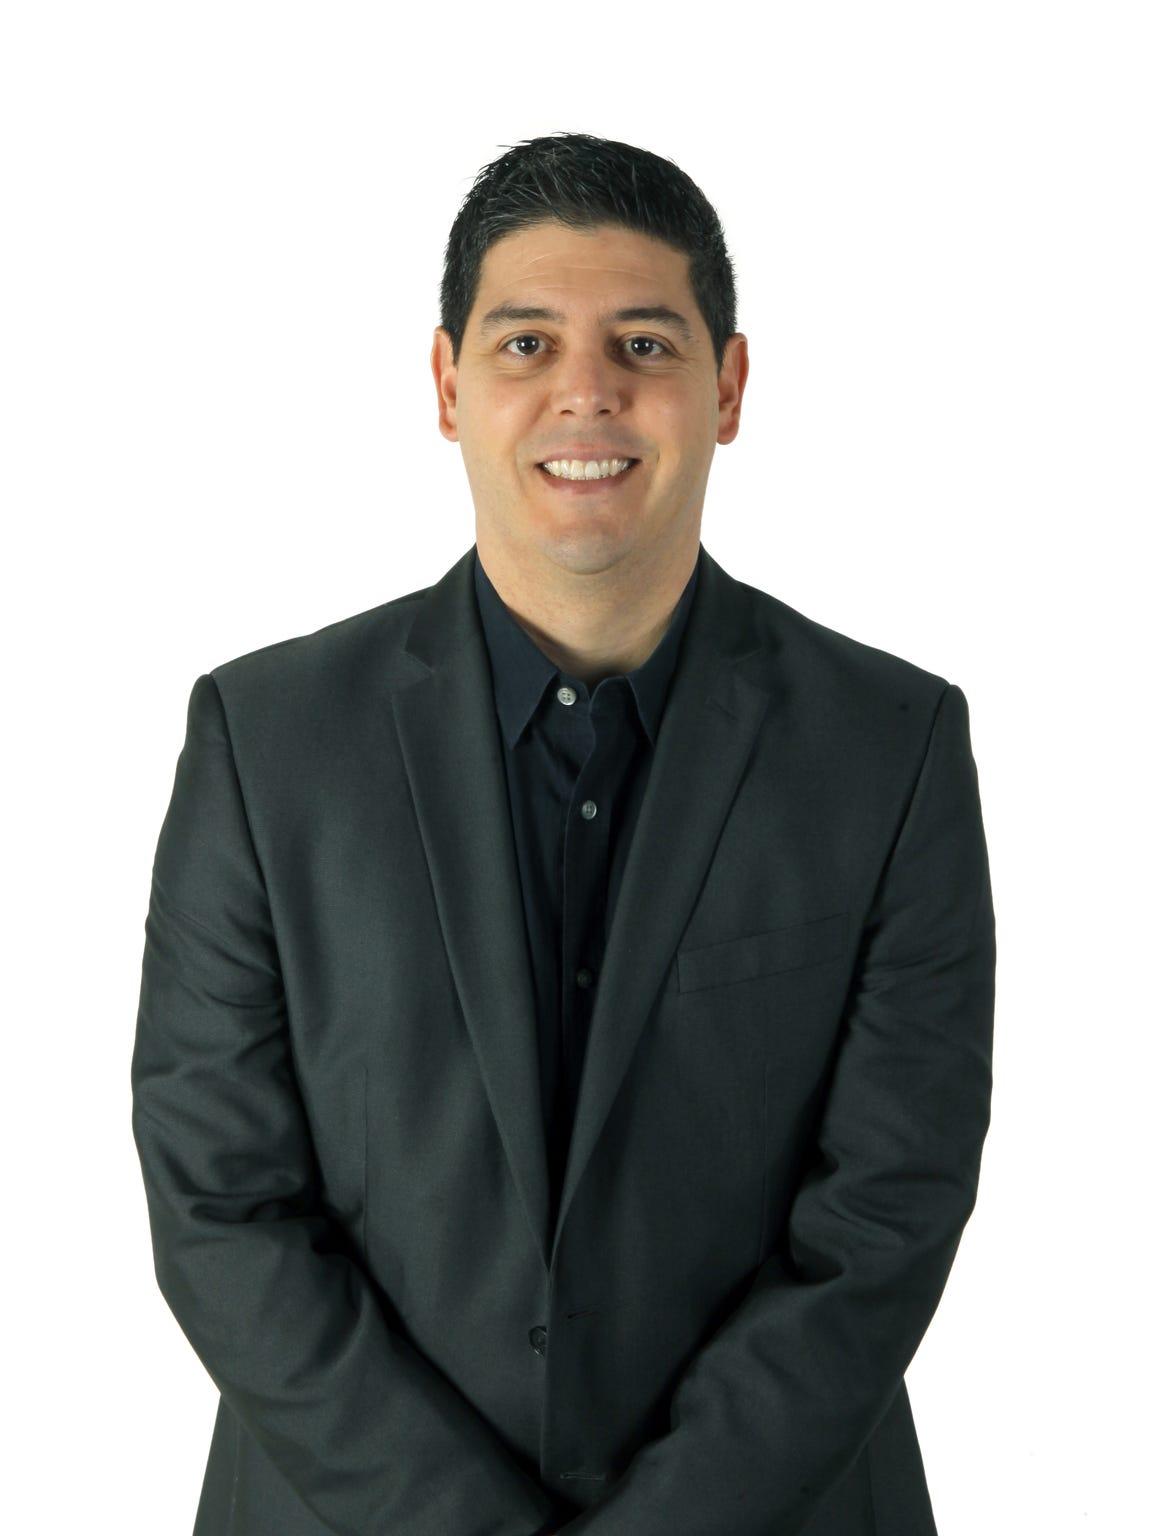 Jeff DiVeronica